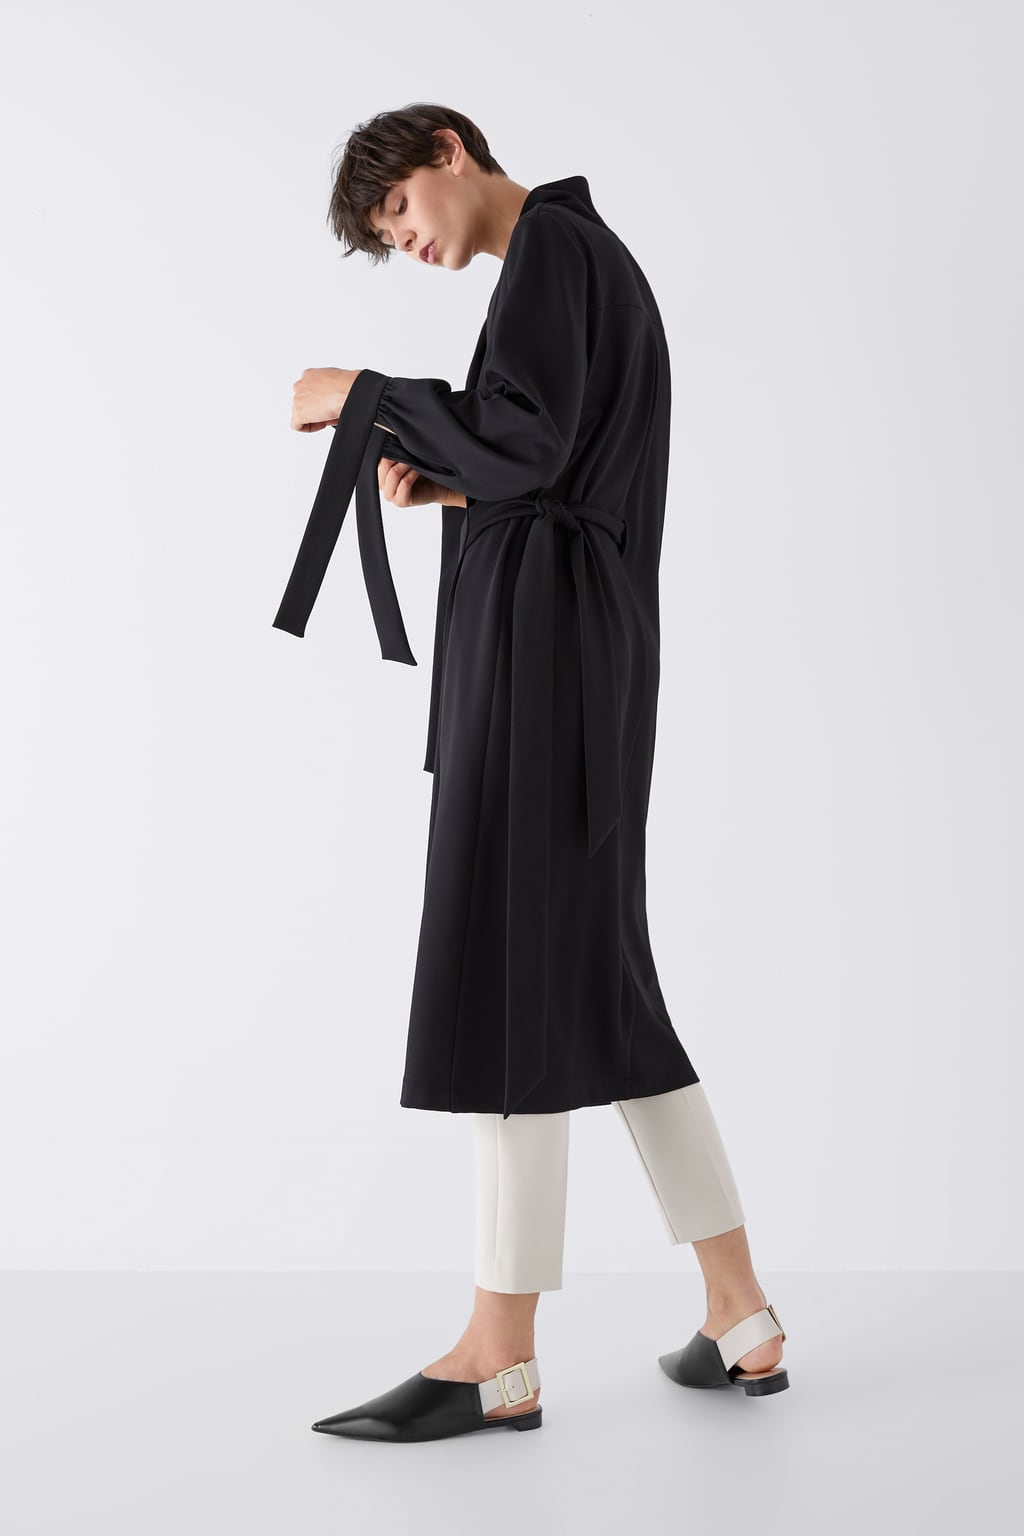 LOW HEELED SLINGBACKS WITH LARGE BUCKLEDETAILS. Zara. $59.90.